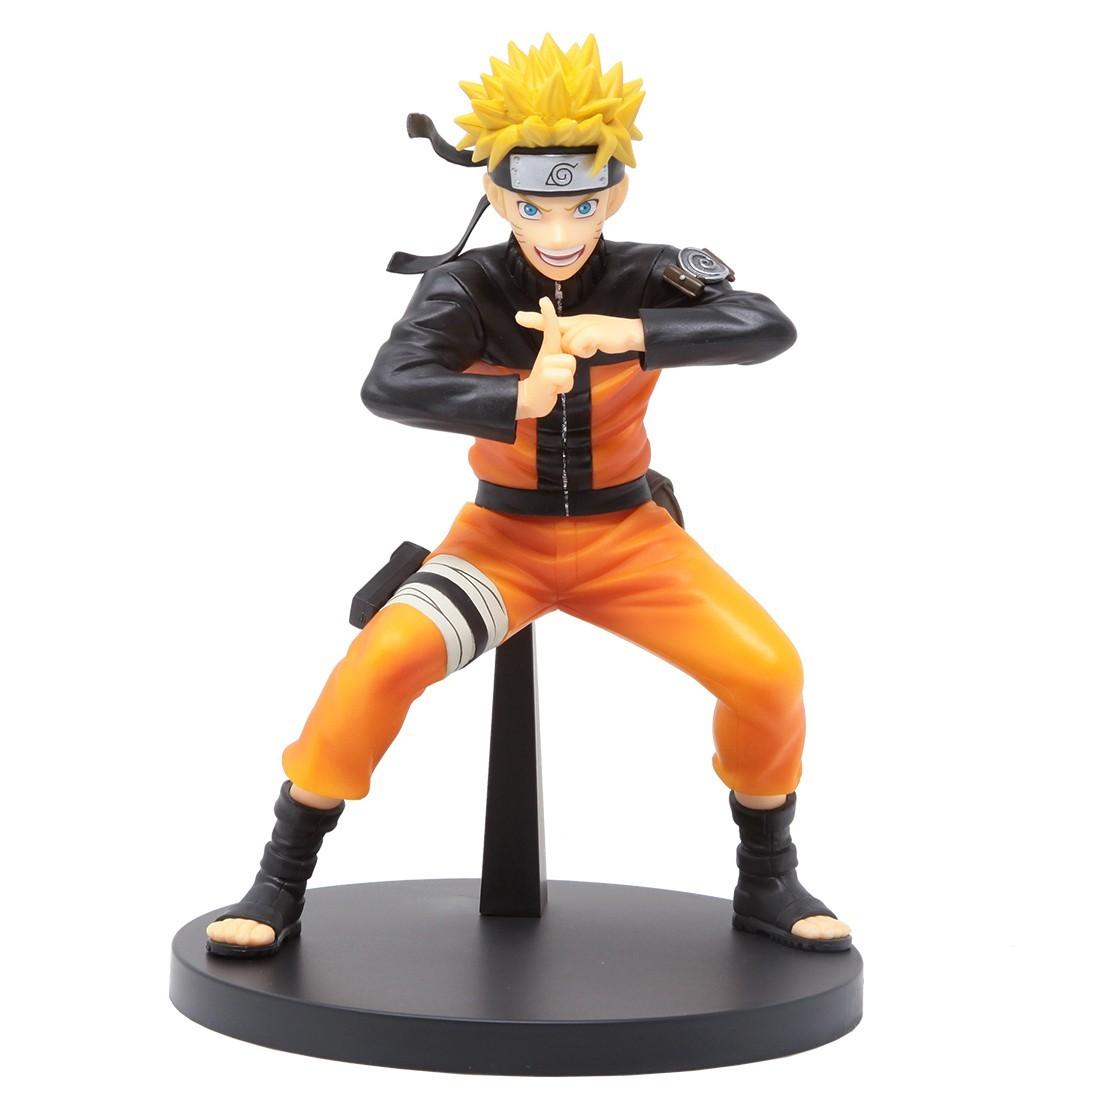 Estátua Naruto Uzumaki: Naruto Shippuden (Vibration Stars II) - Banpresto